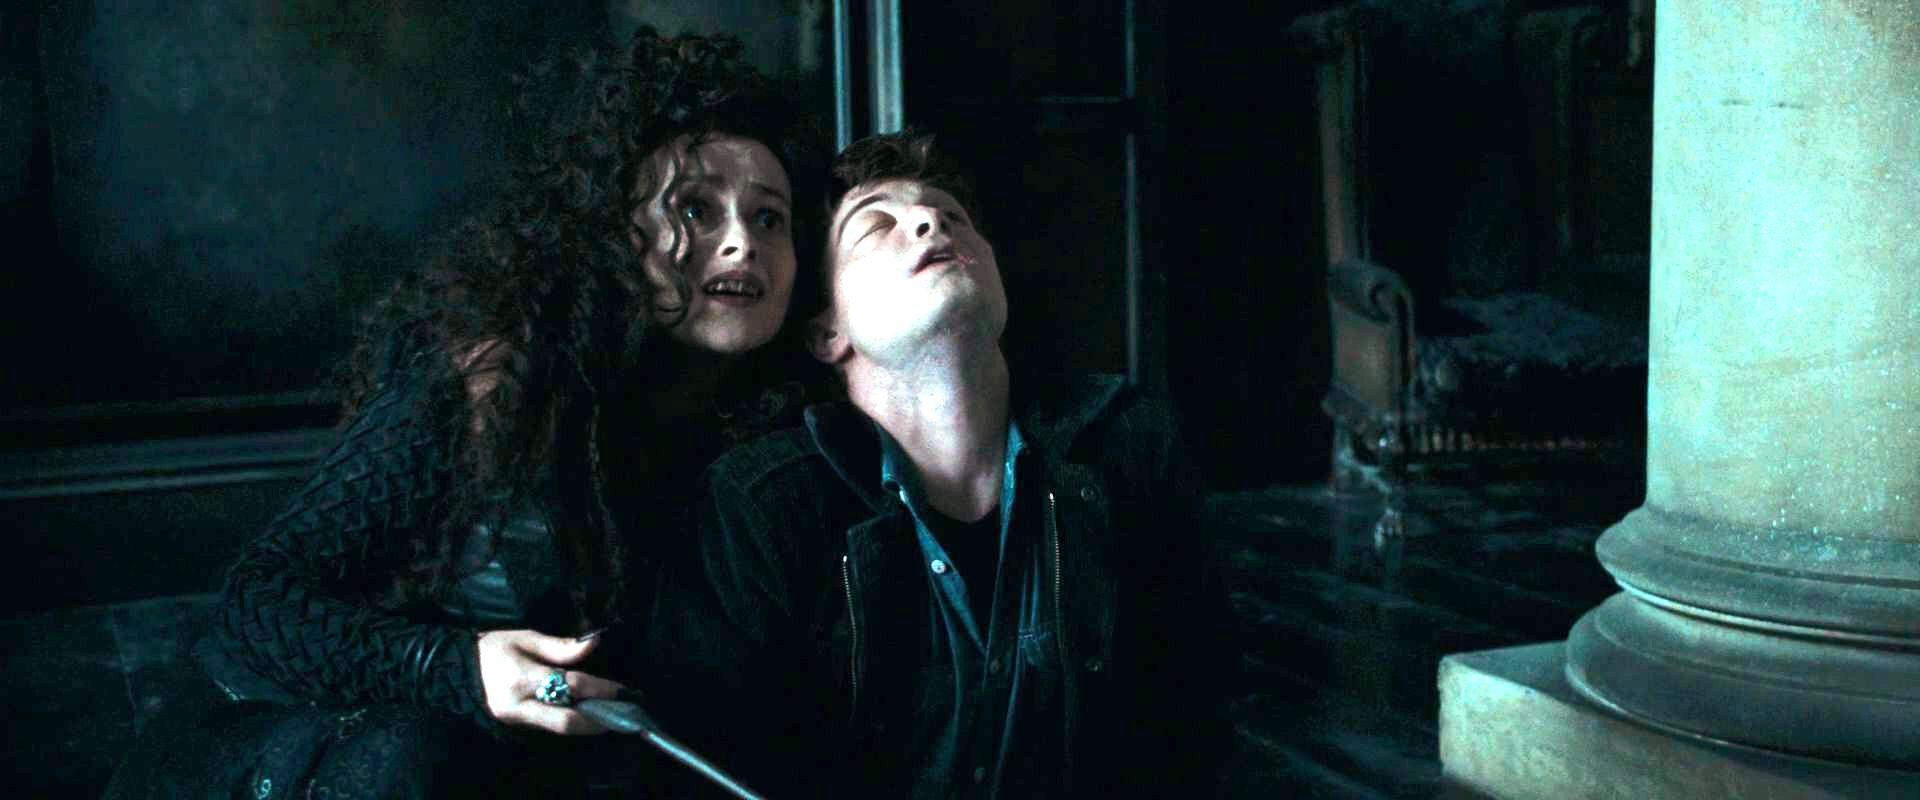 Bellatrix and Harry